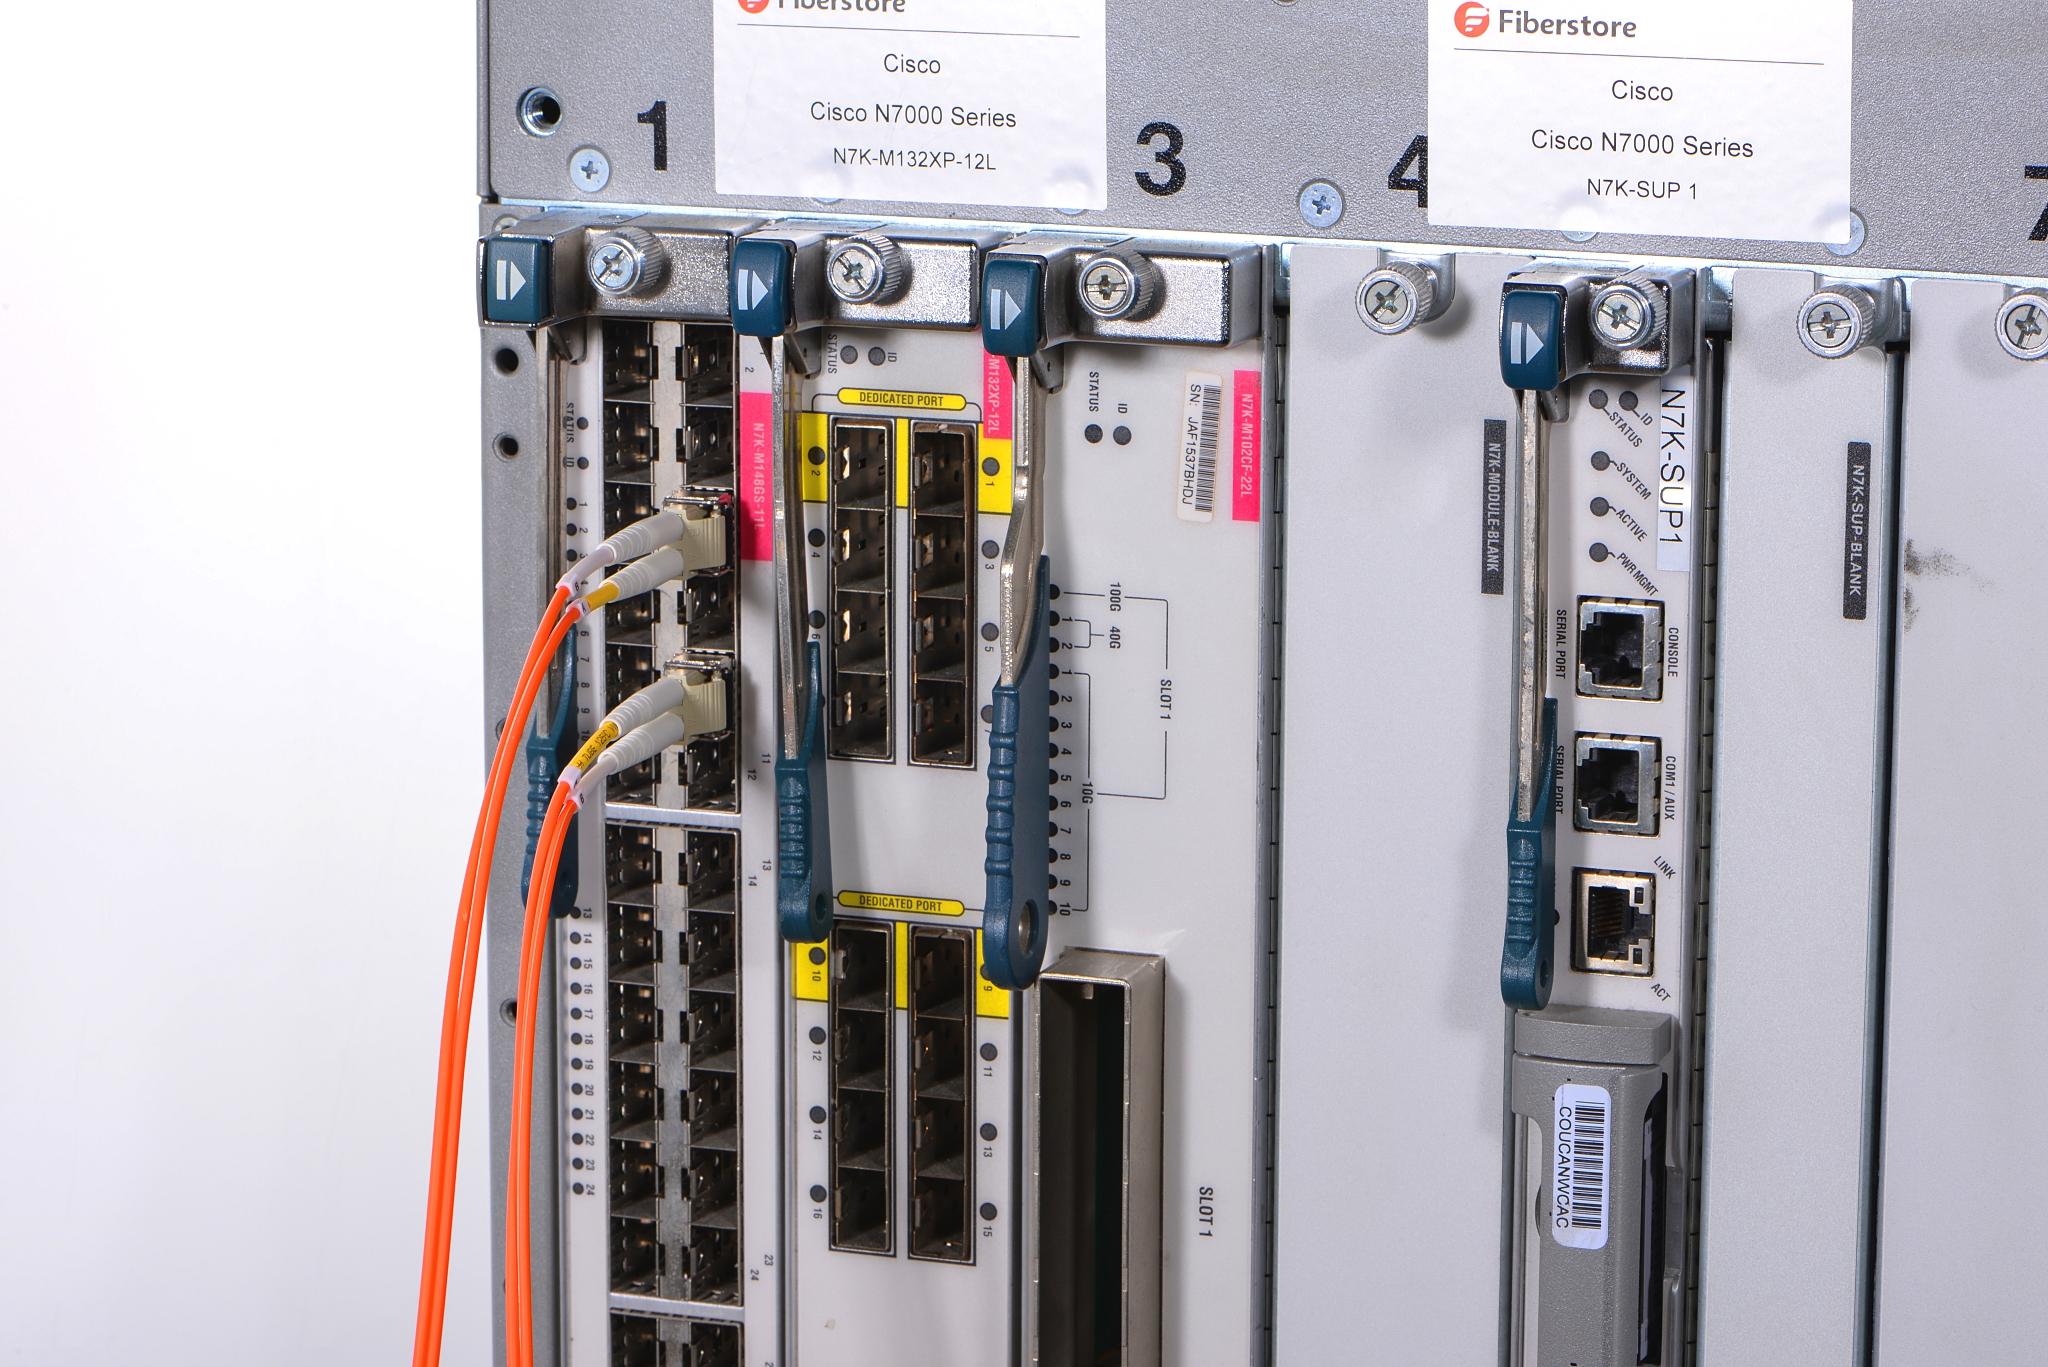 Cisco N7K-M132-12L test bed